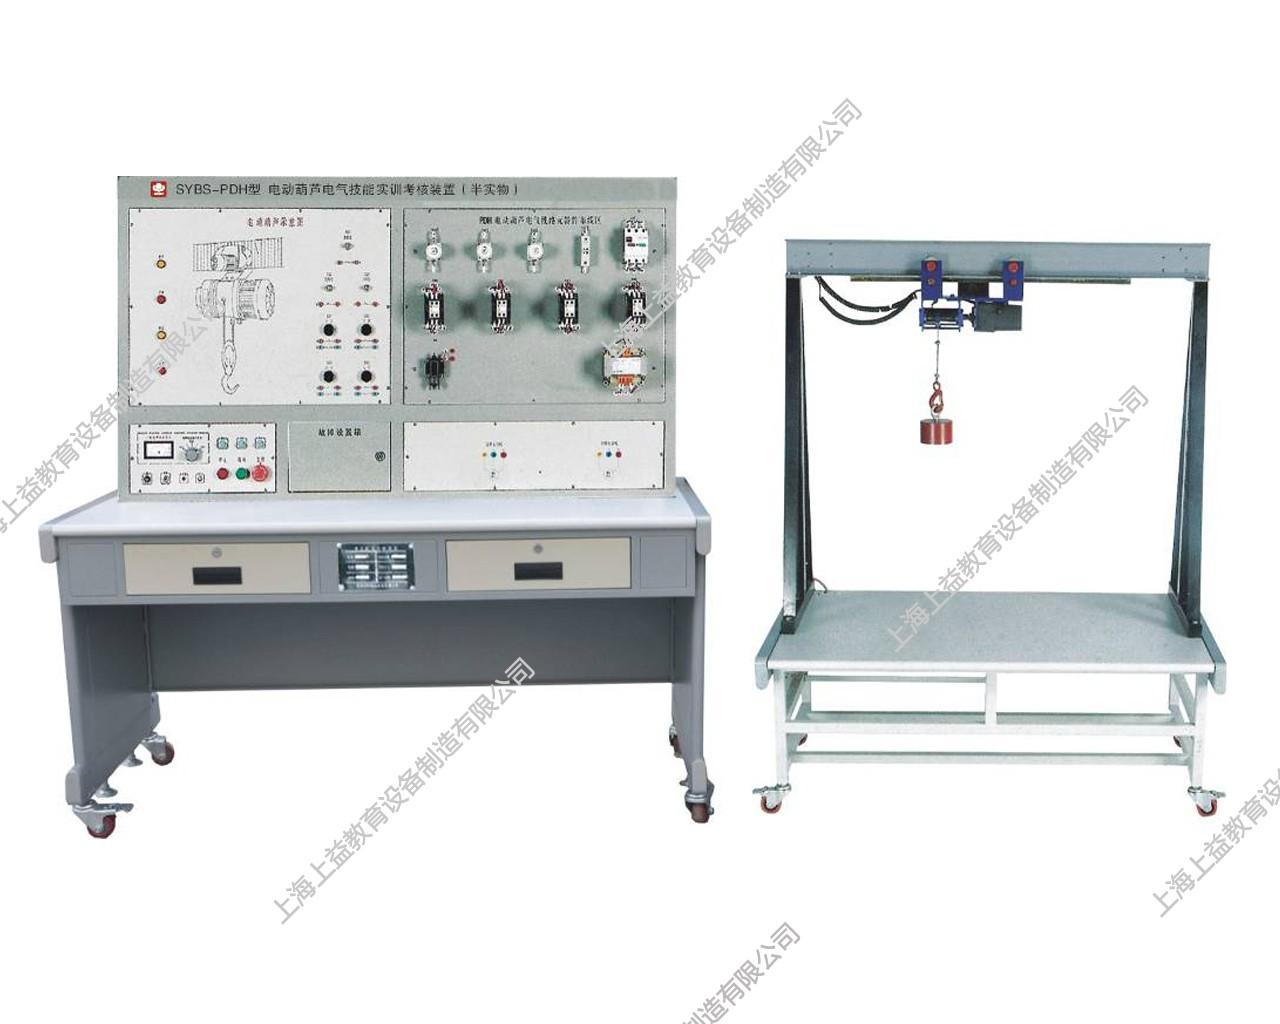 SYBS-PDH电动葫芦电气技能wwwlehu8viplehu68vip装置(半实物)